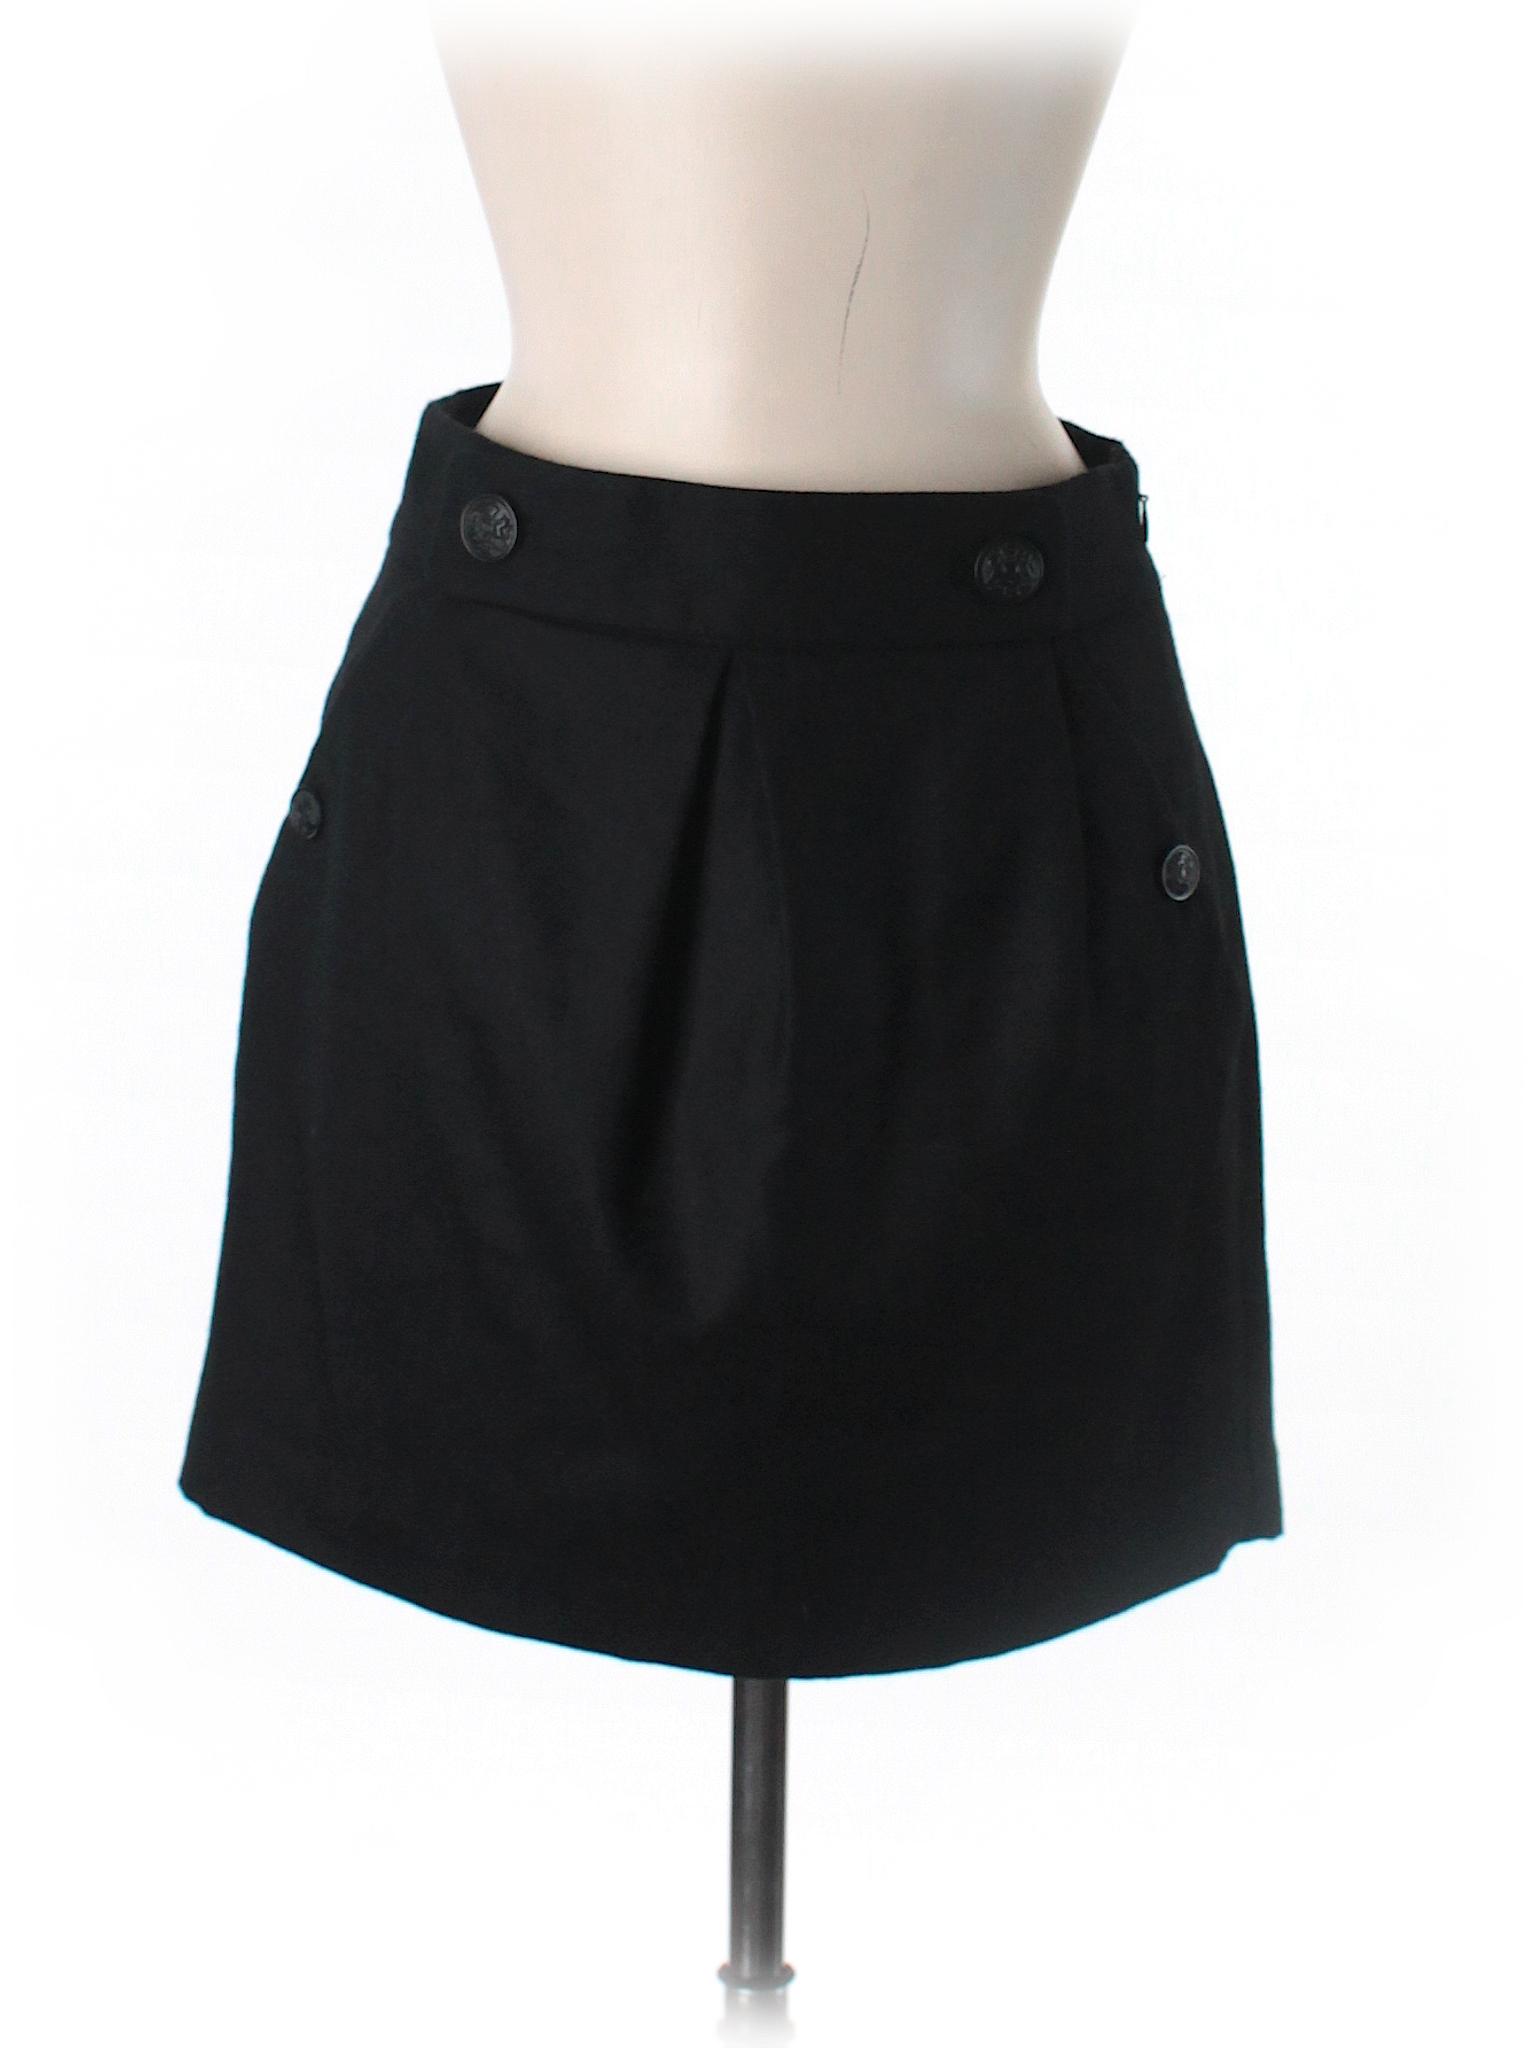 Republic Banana Skirt leisure Boutique Wool xnEfY8w0qT